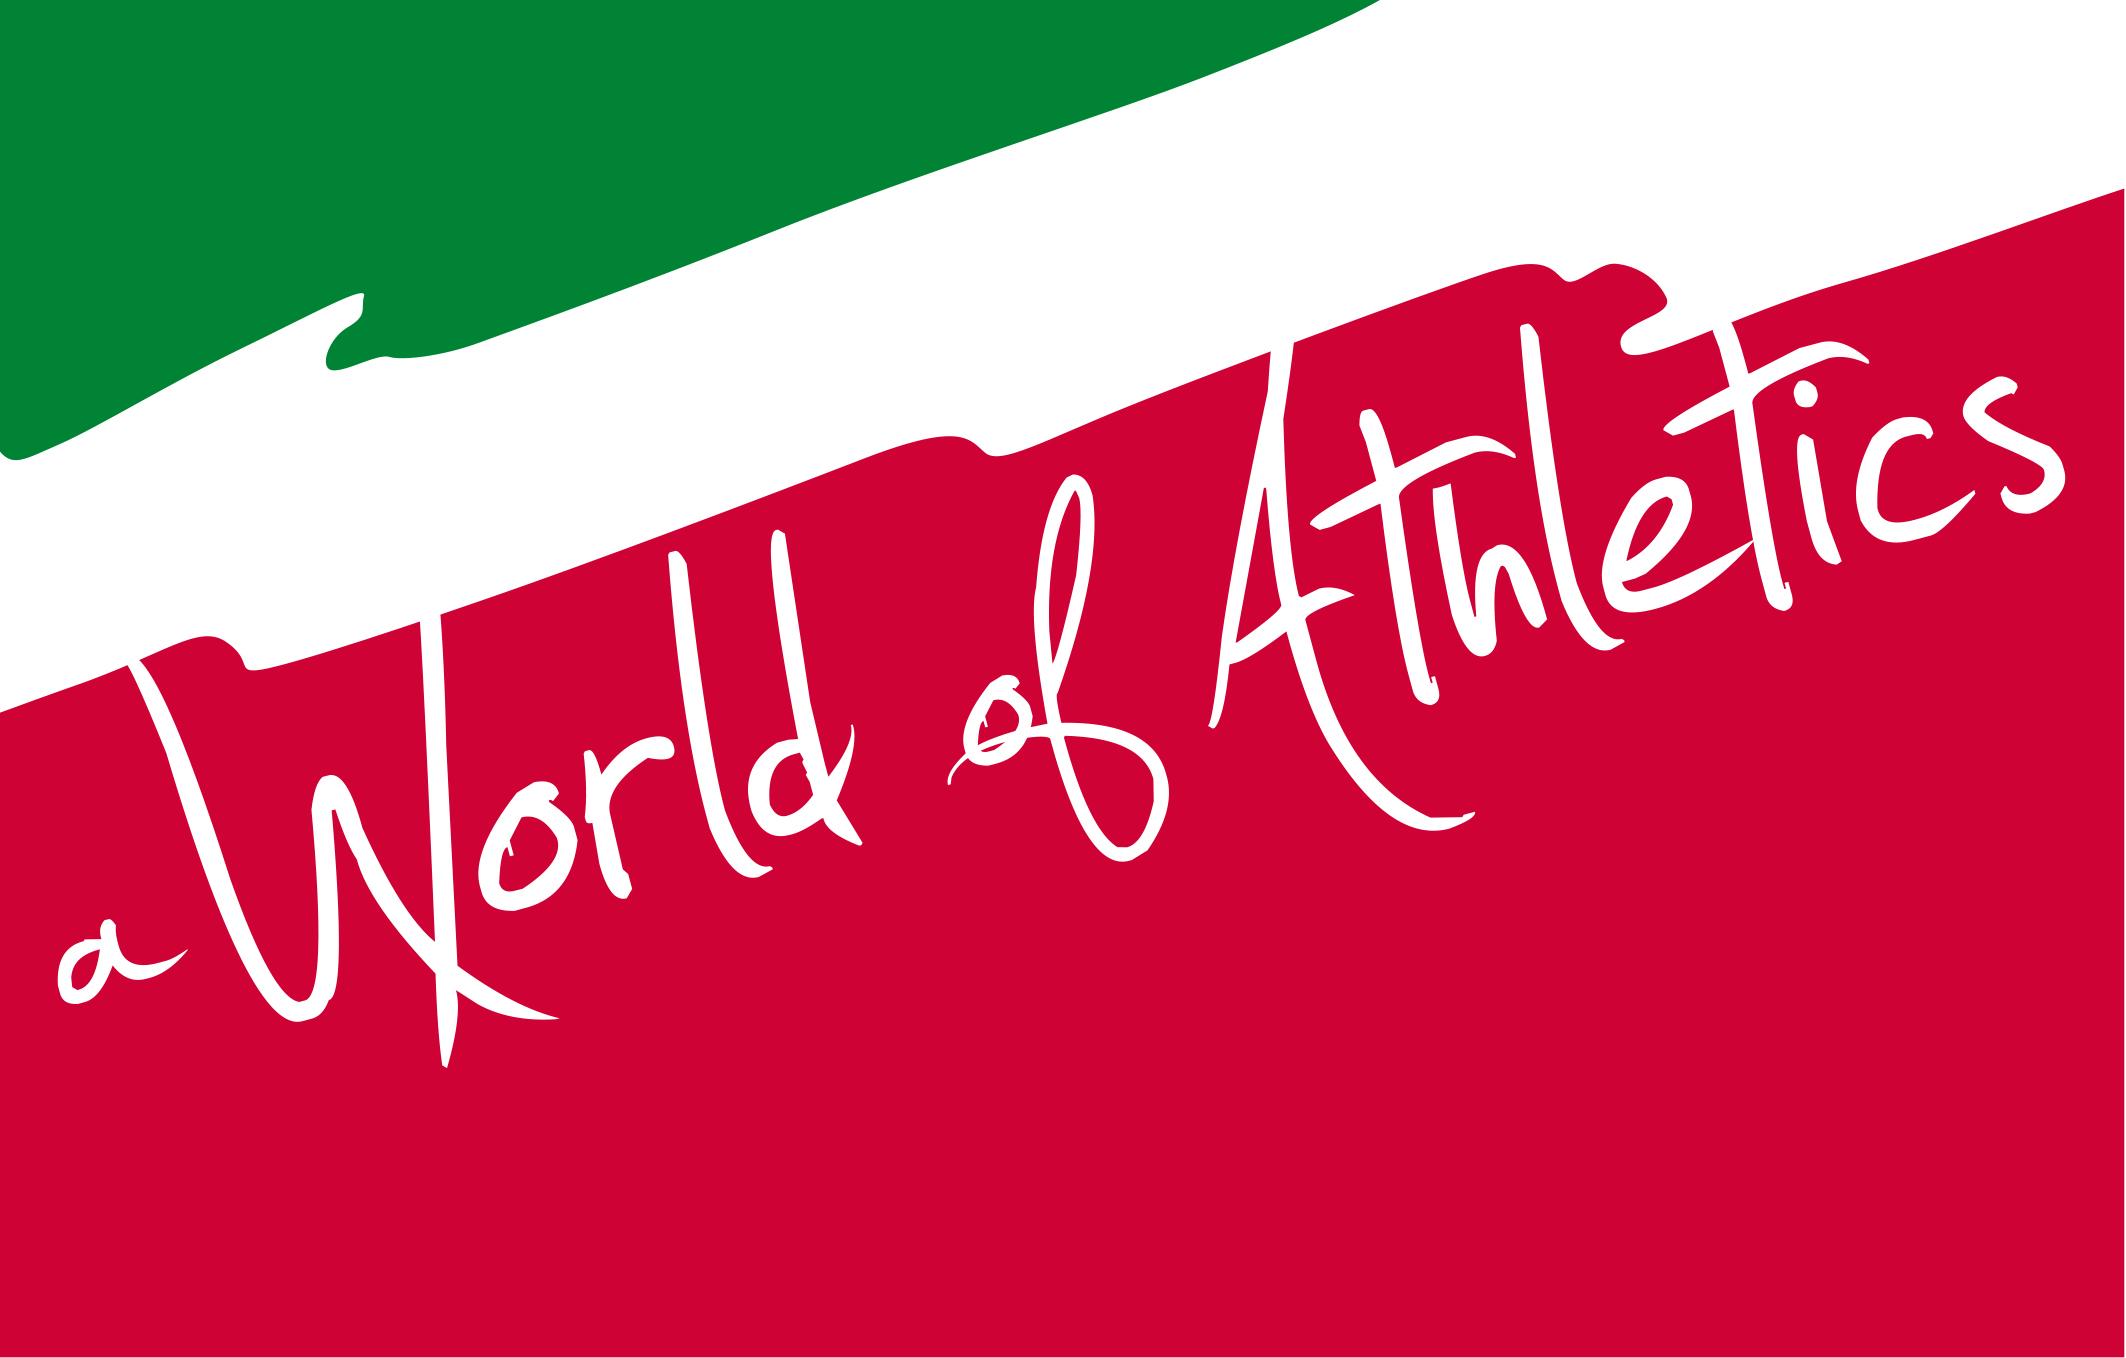 A World of Athletics